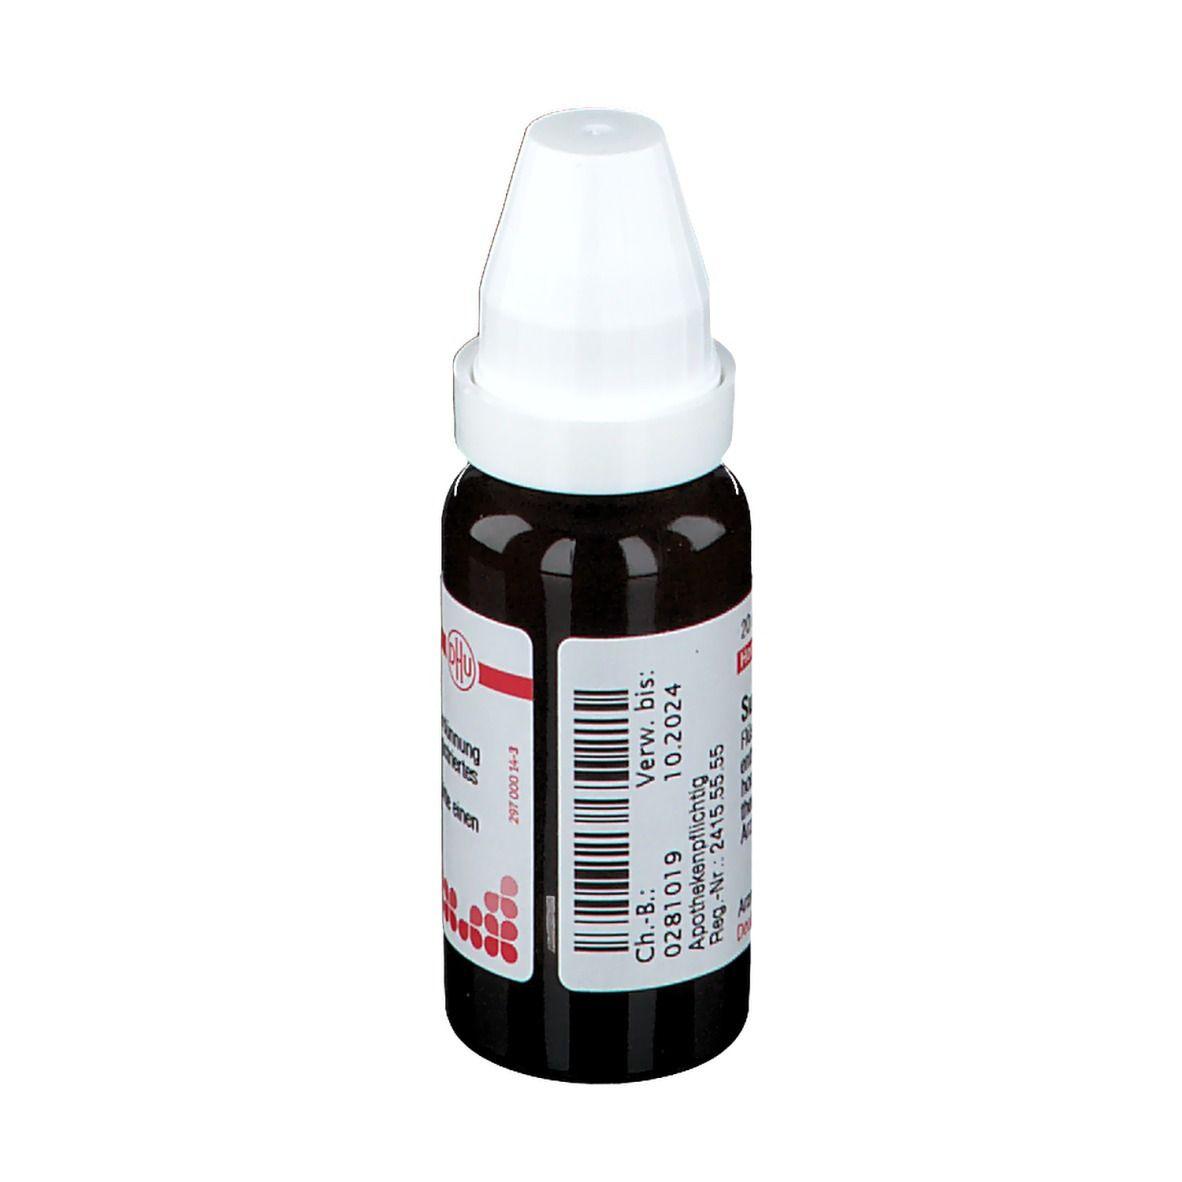 DHU Sulfur D6